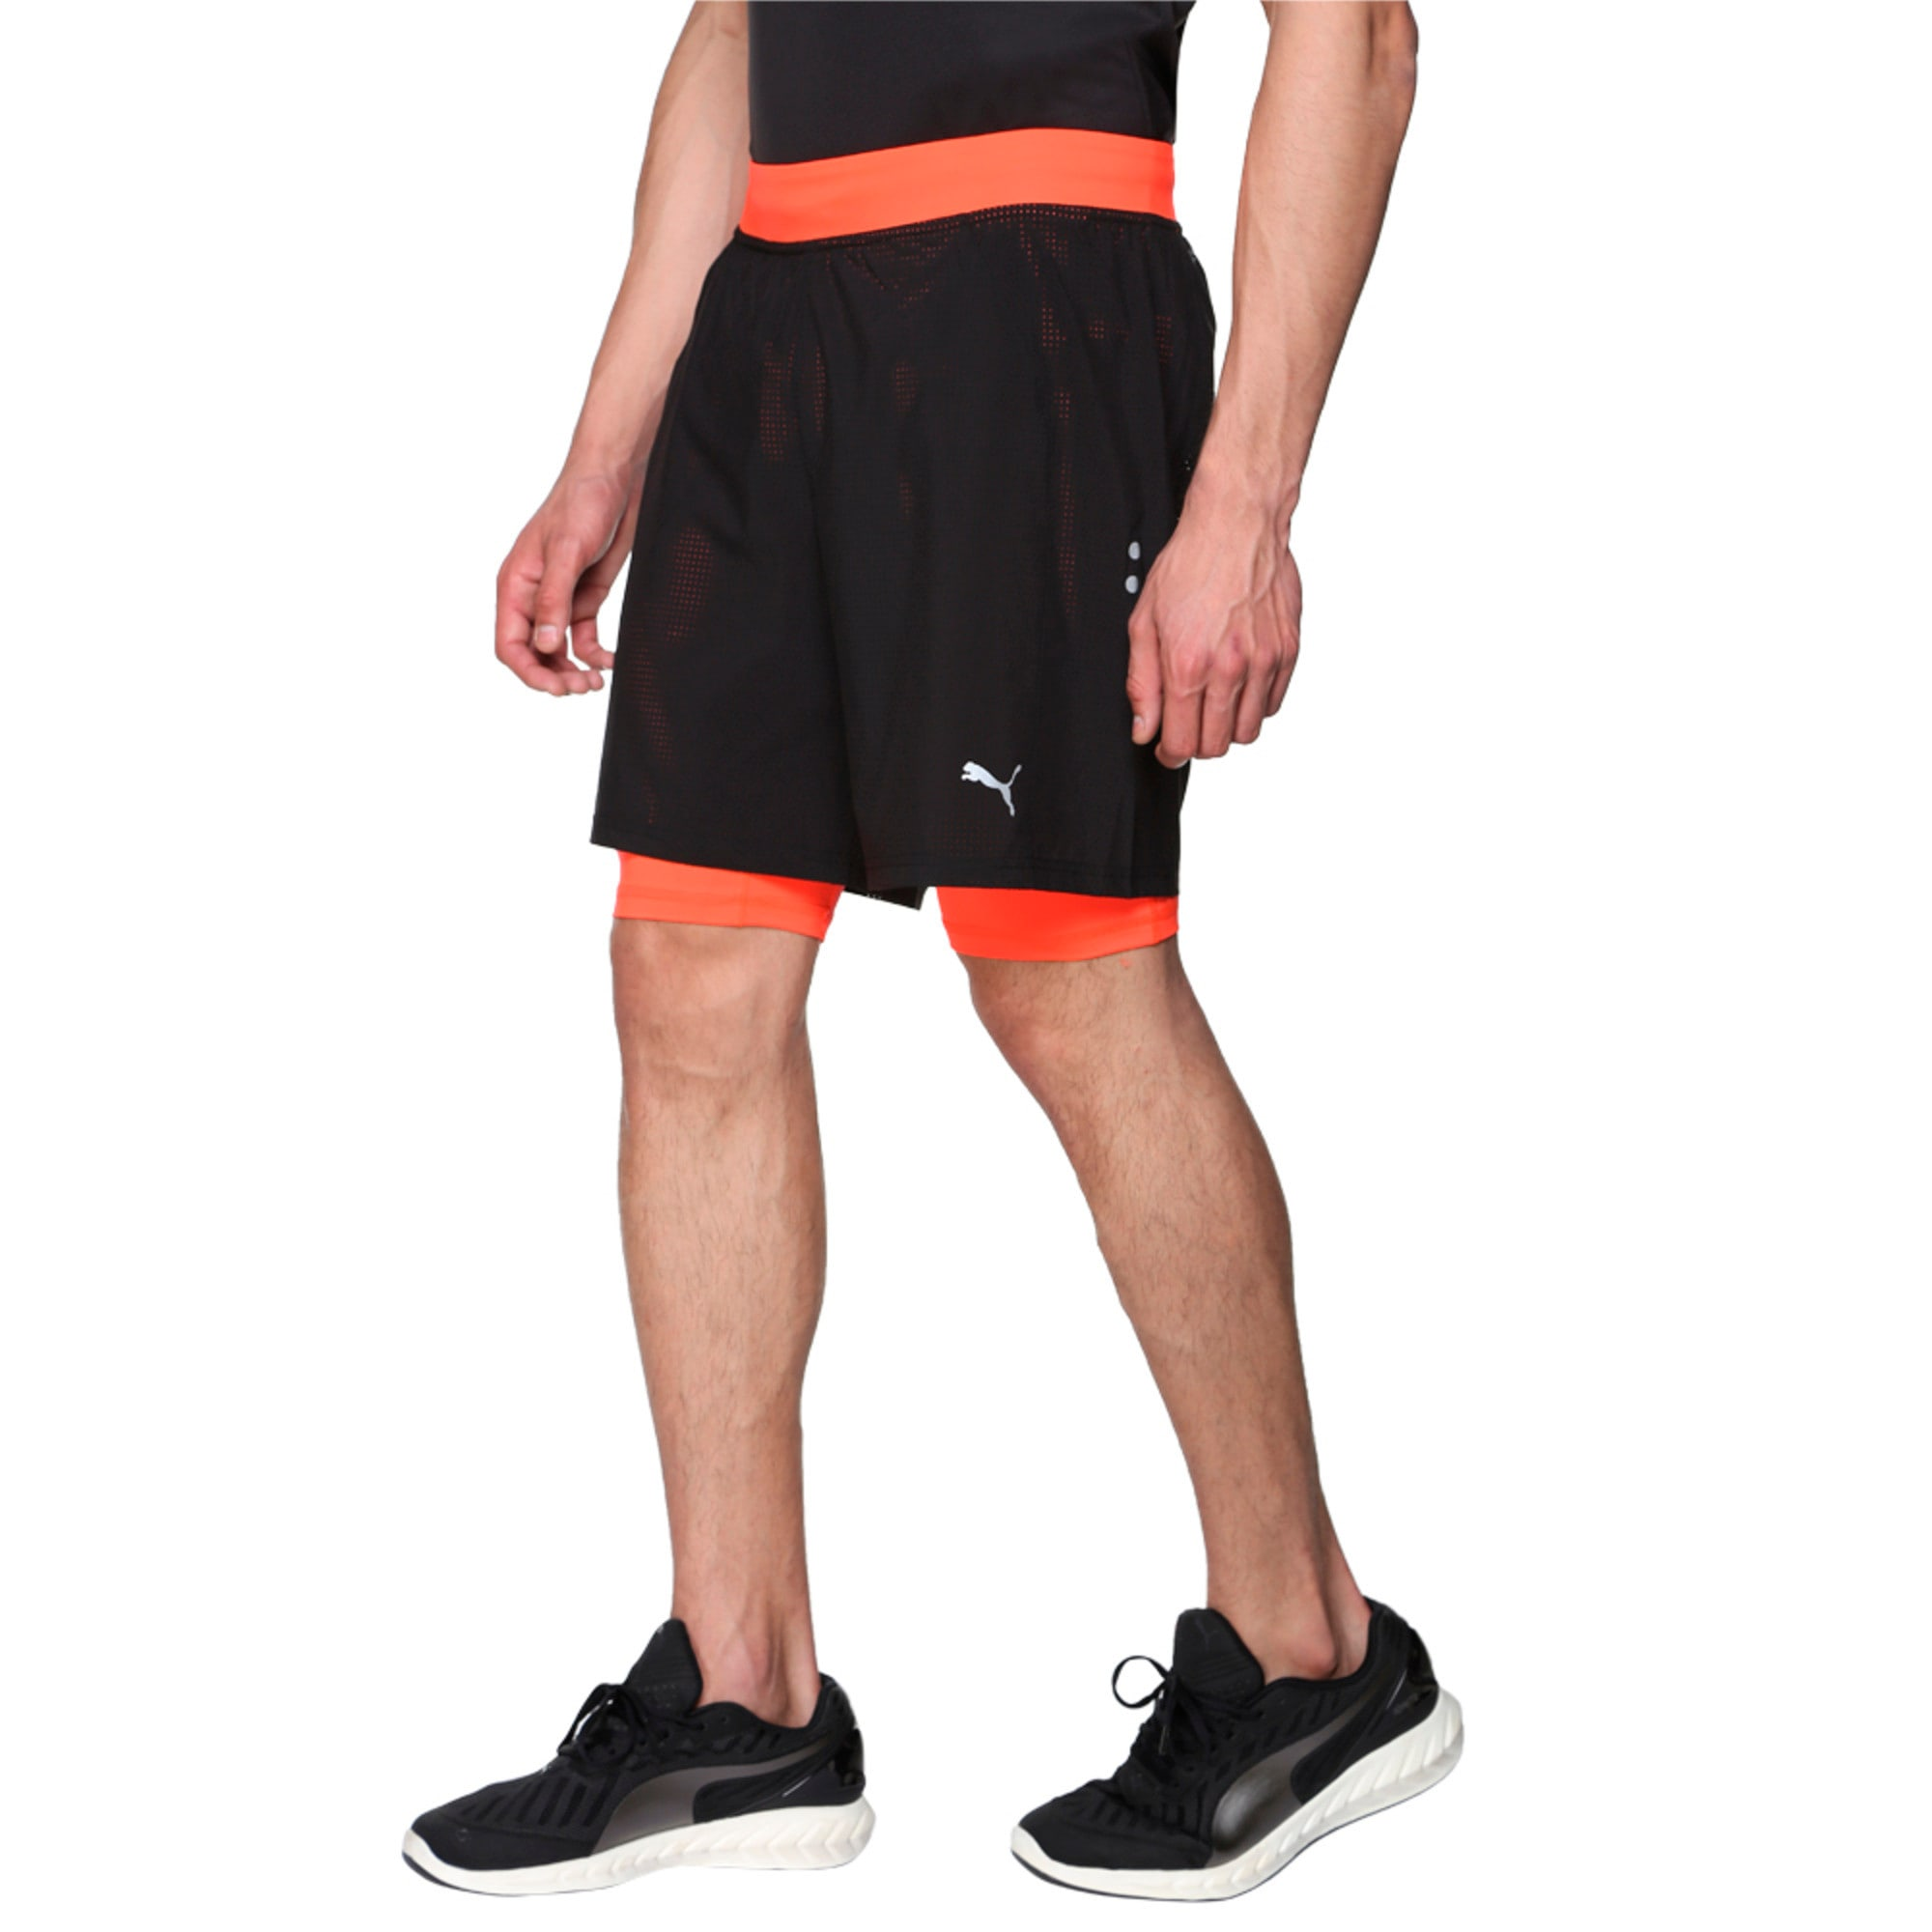 Thumbnail 2 of Running Faster Than You Men's 2 in 1 Shorts, Puma Black-Red Blast, medium-IND